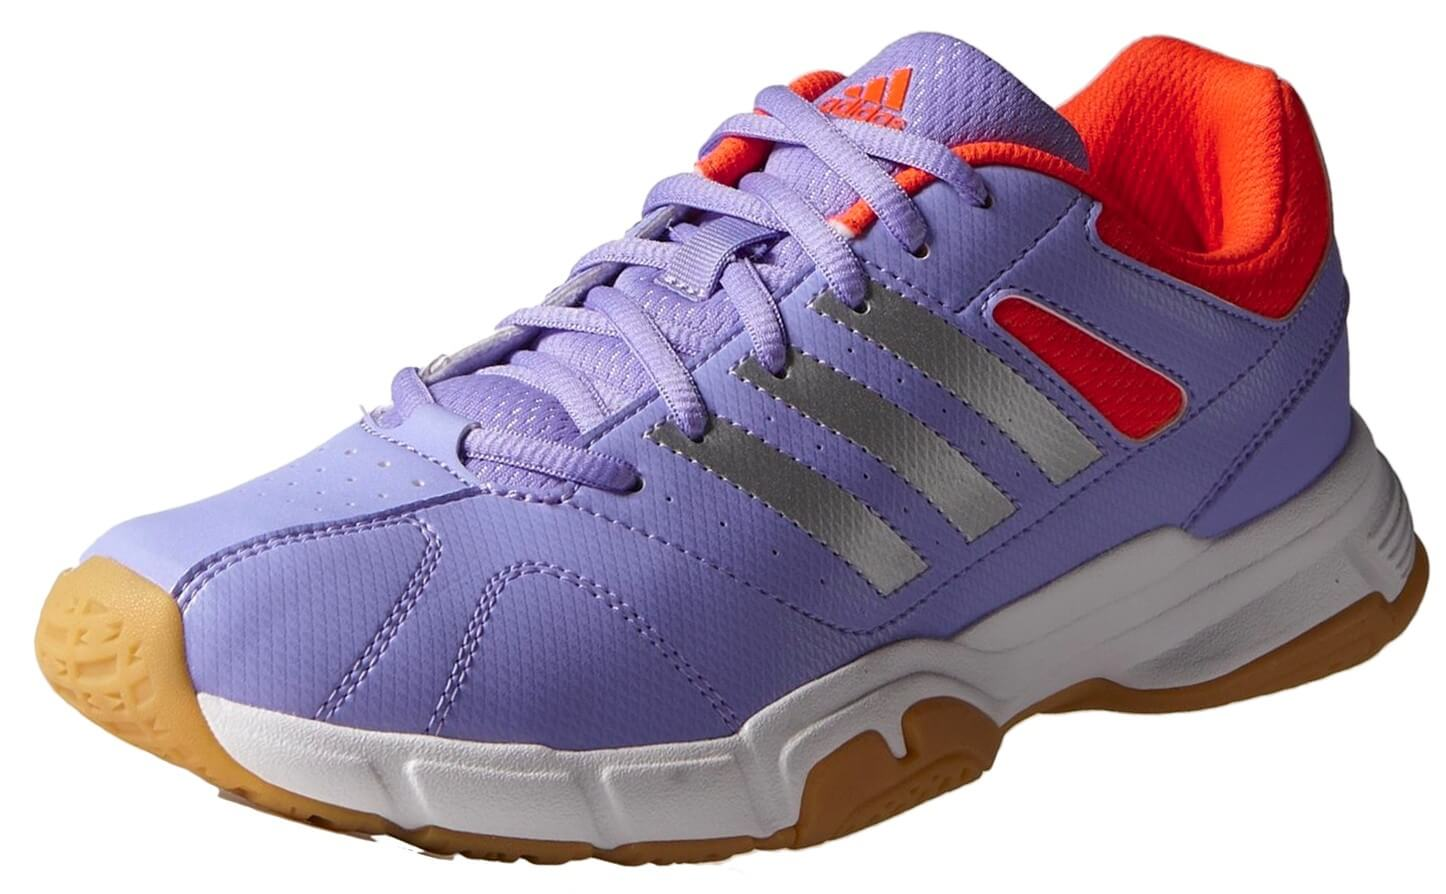 chaussures de salle asics badminton